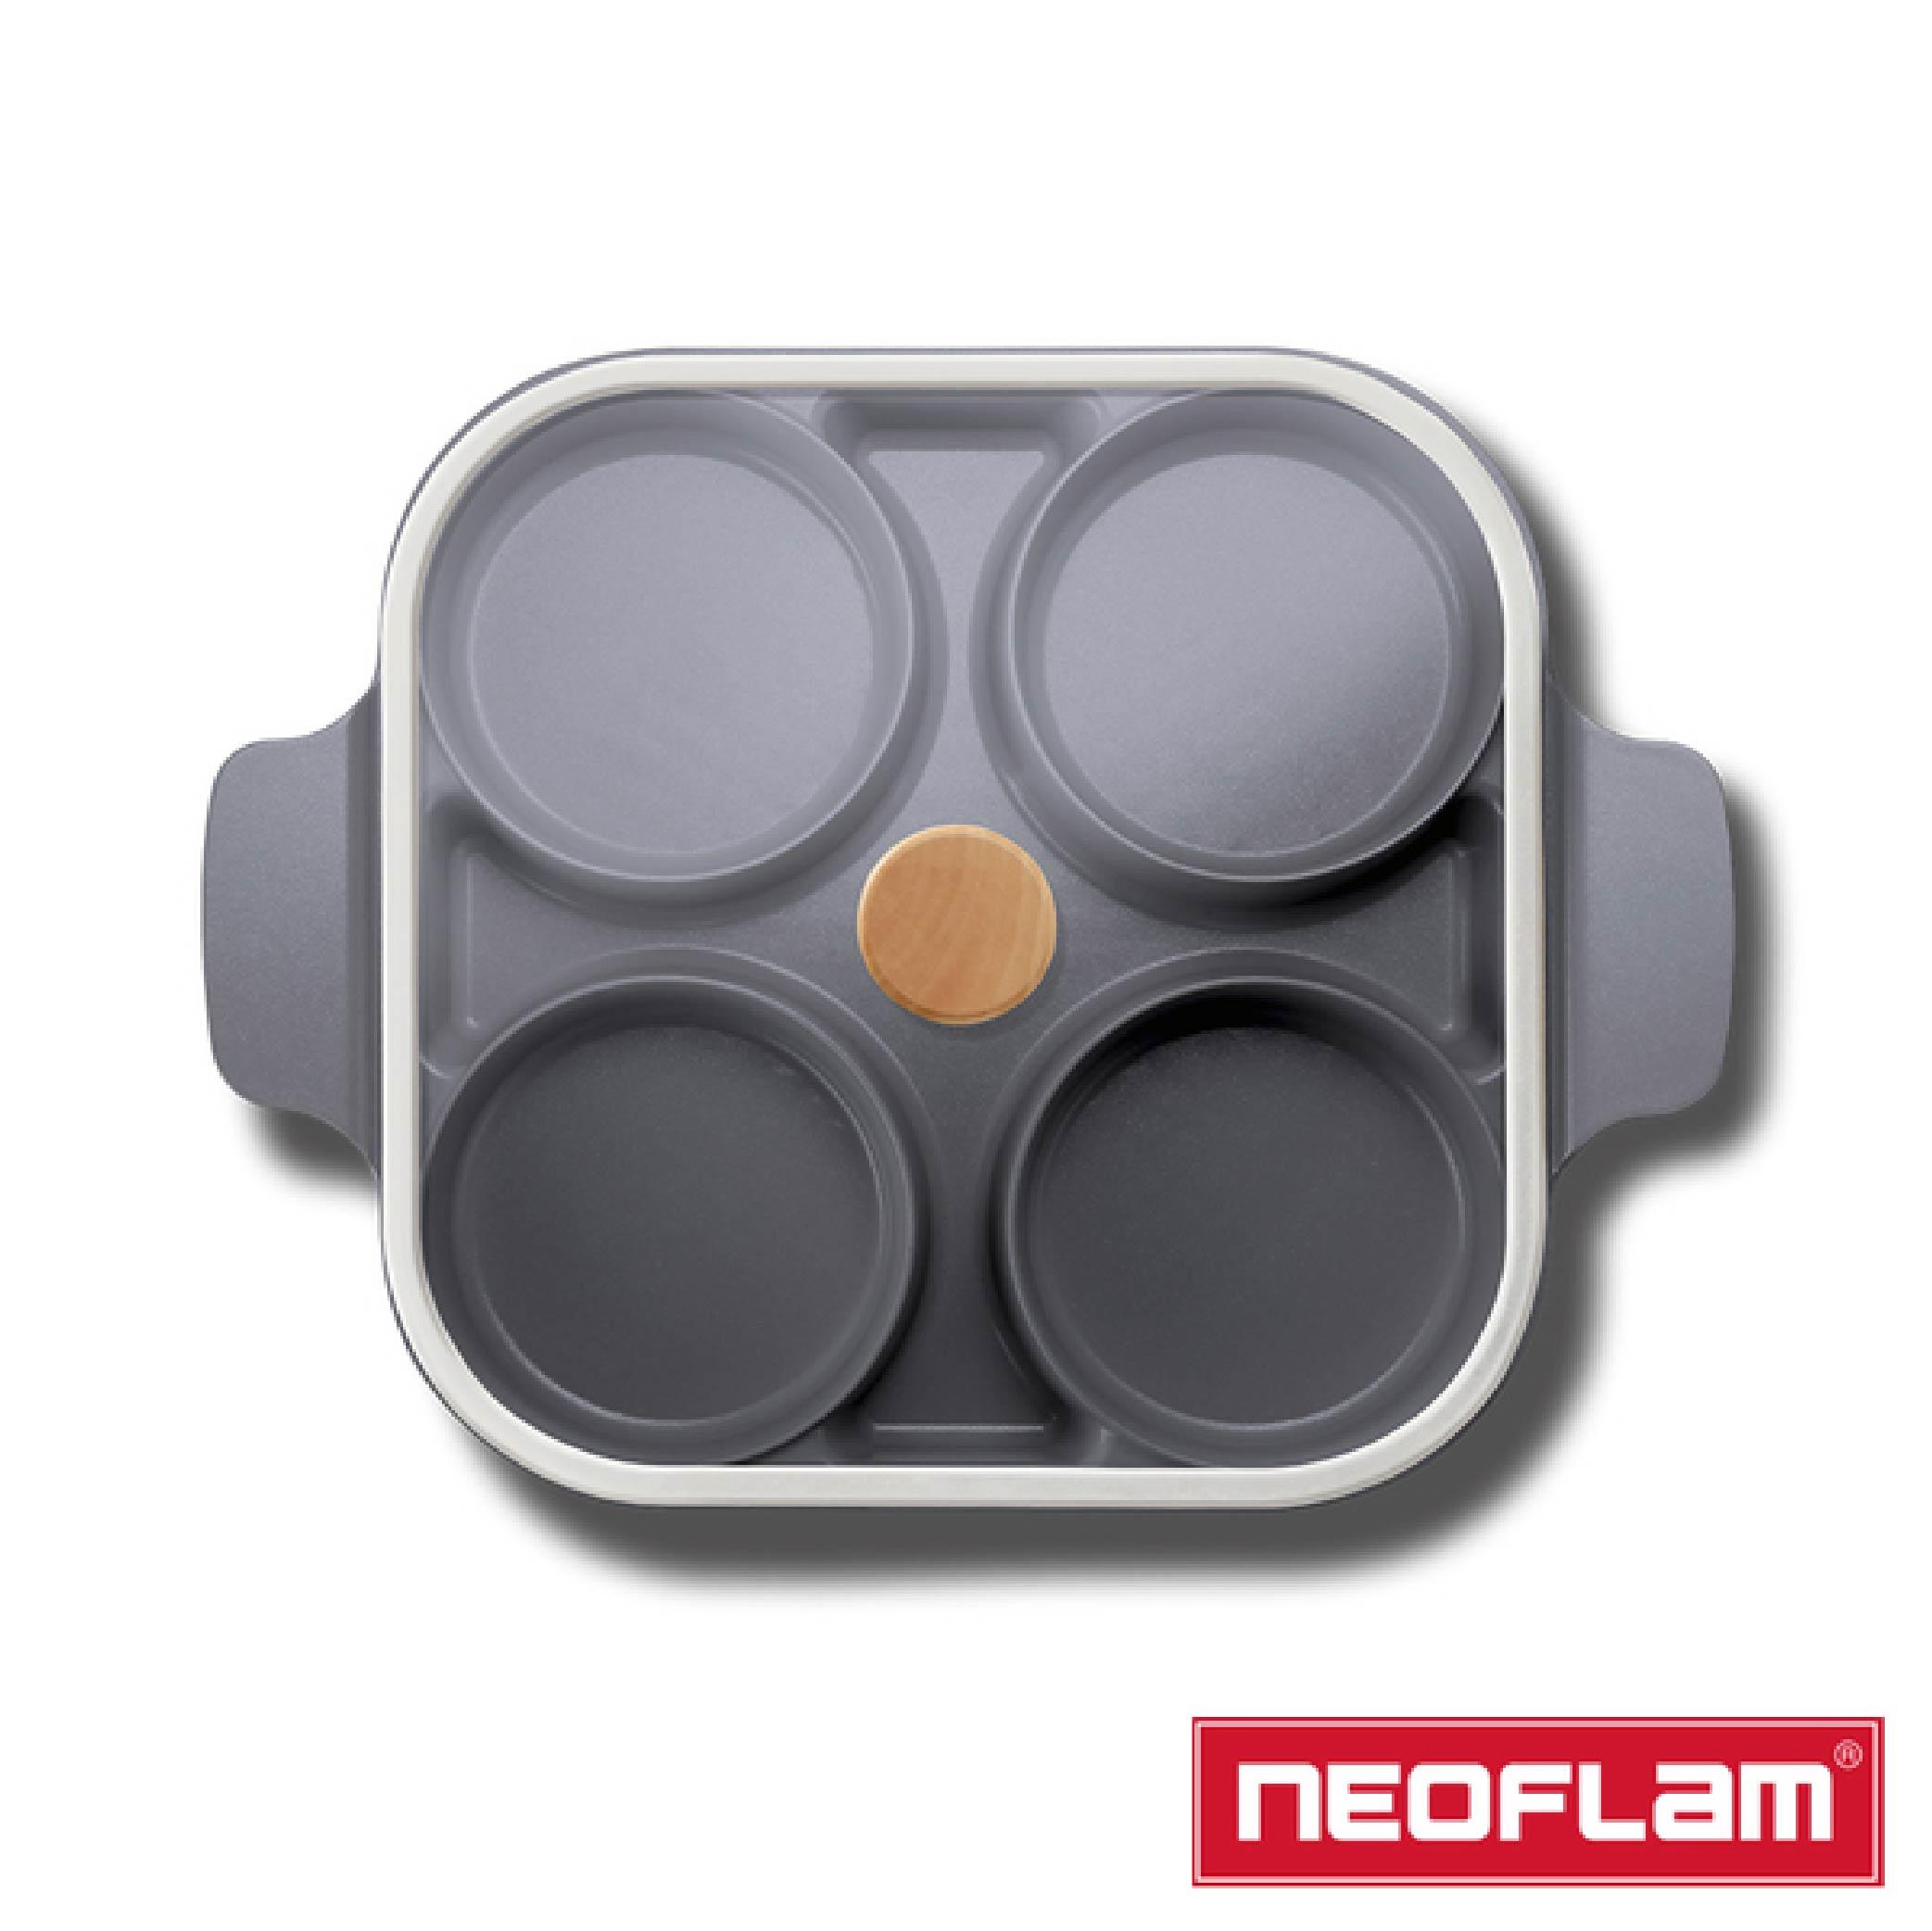 【NEOFLAM】Steam Plus Pan雙耳烹飪神器&玻璃蓋-FIKA(IH爐適用/不挑爐具/含玻璃蓋)